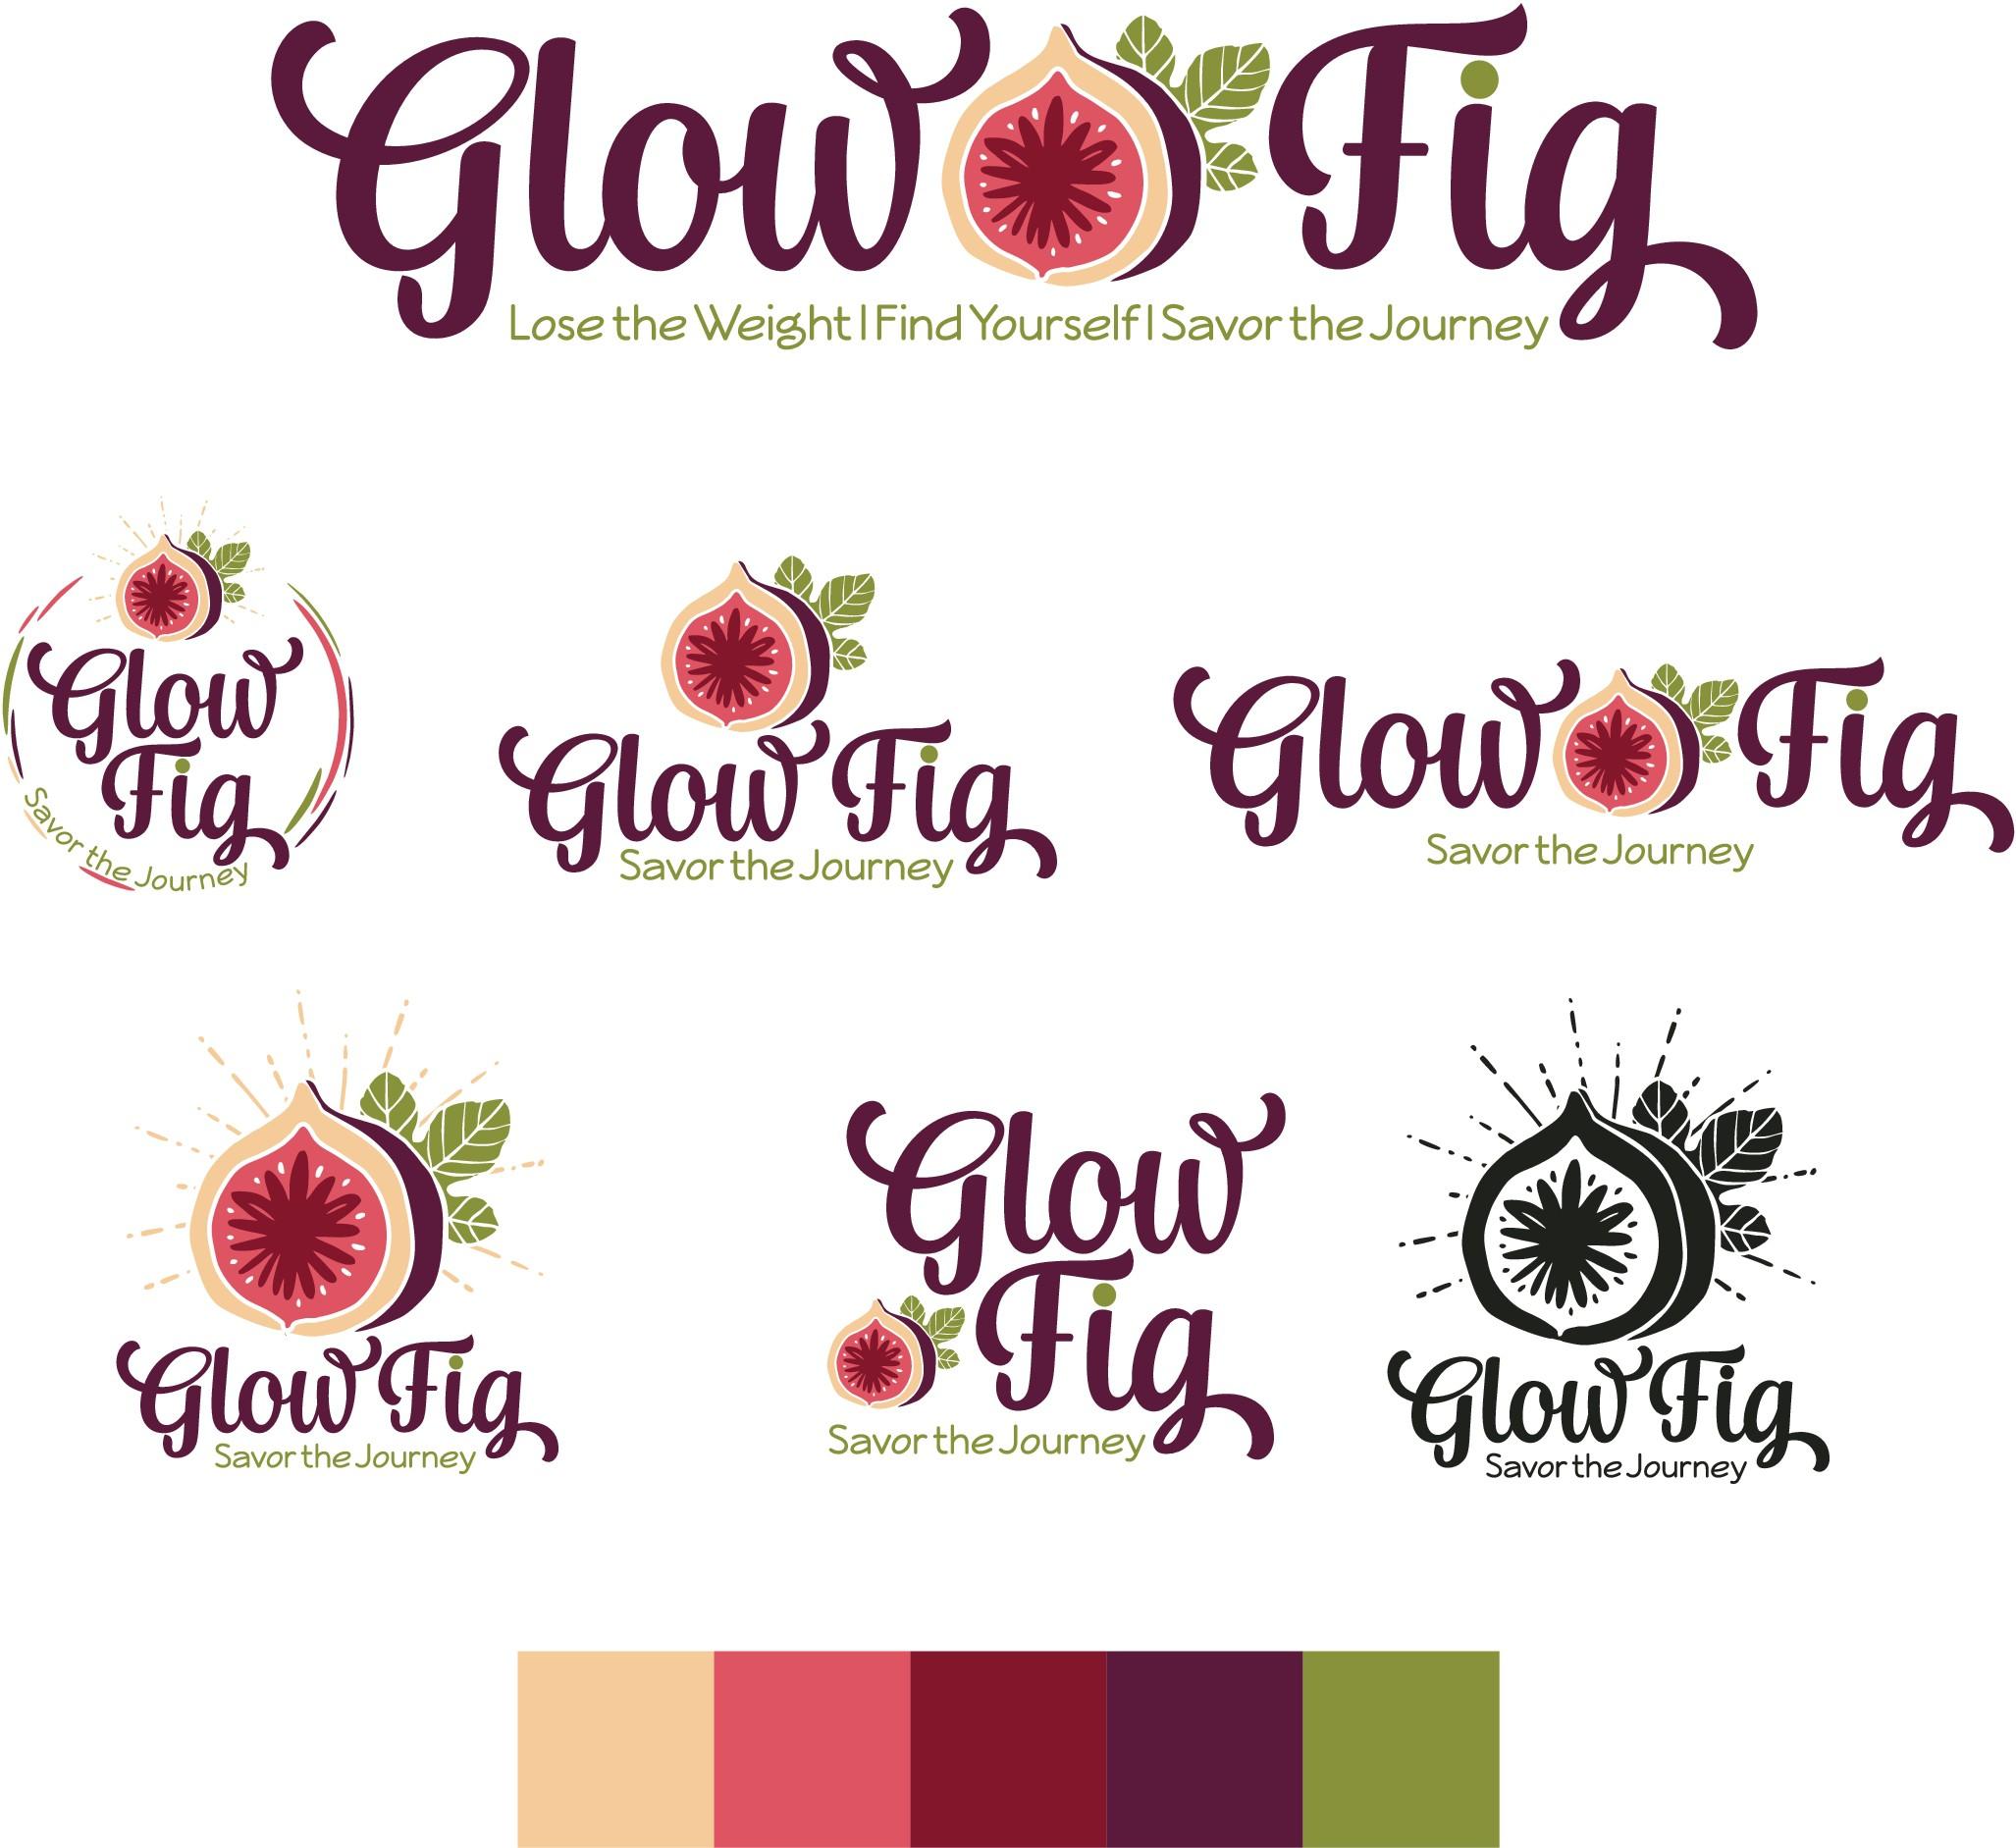 Create a fresh, inspiring, healthy fun logo for weight loss focused blog/brand!